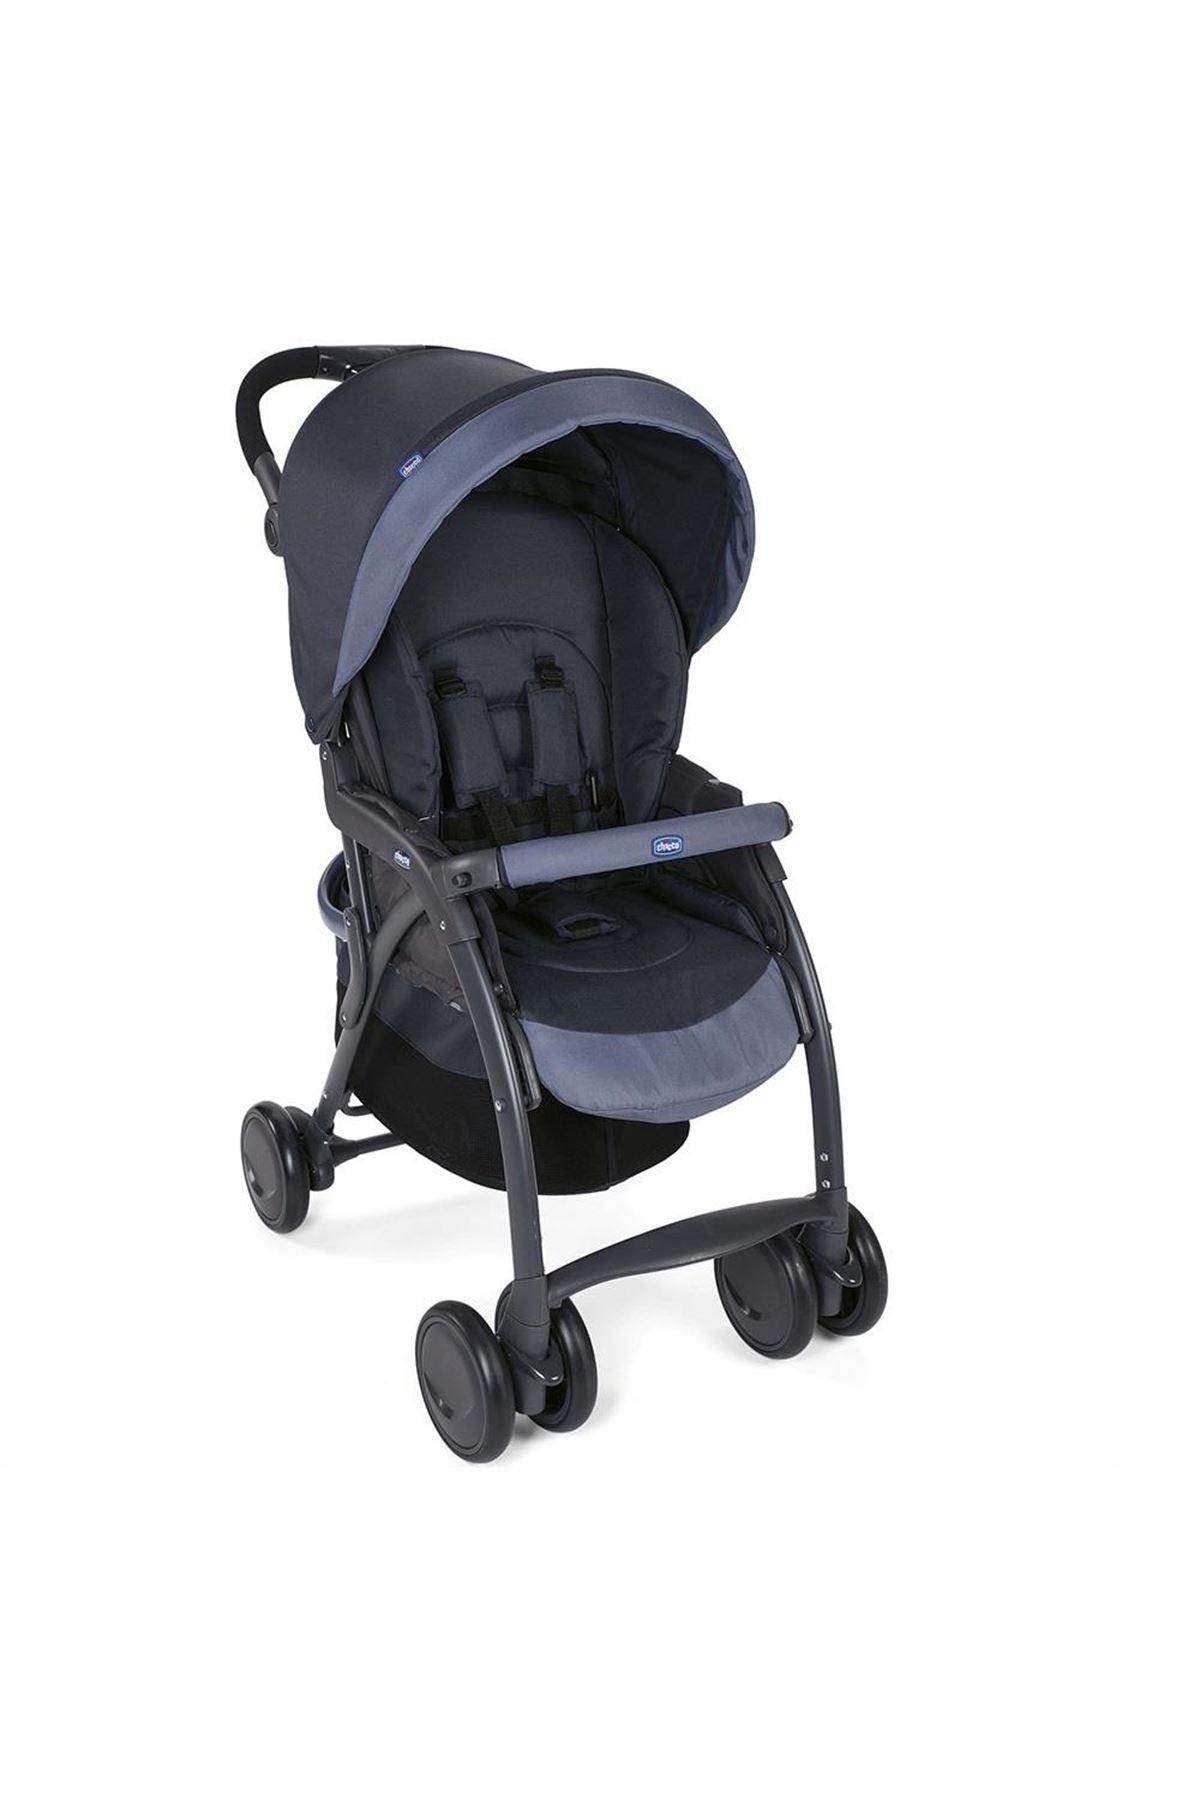 Chicco Simplicity Plus Top Bebek Arabası İndia İnk